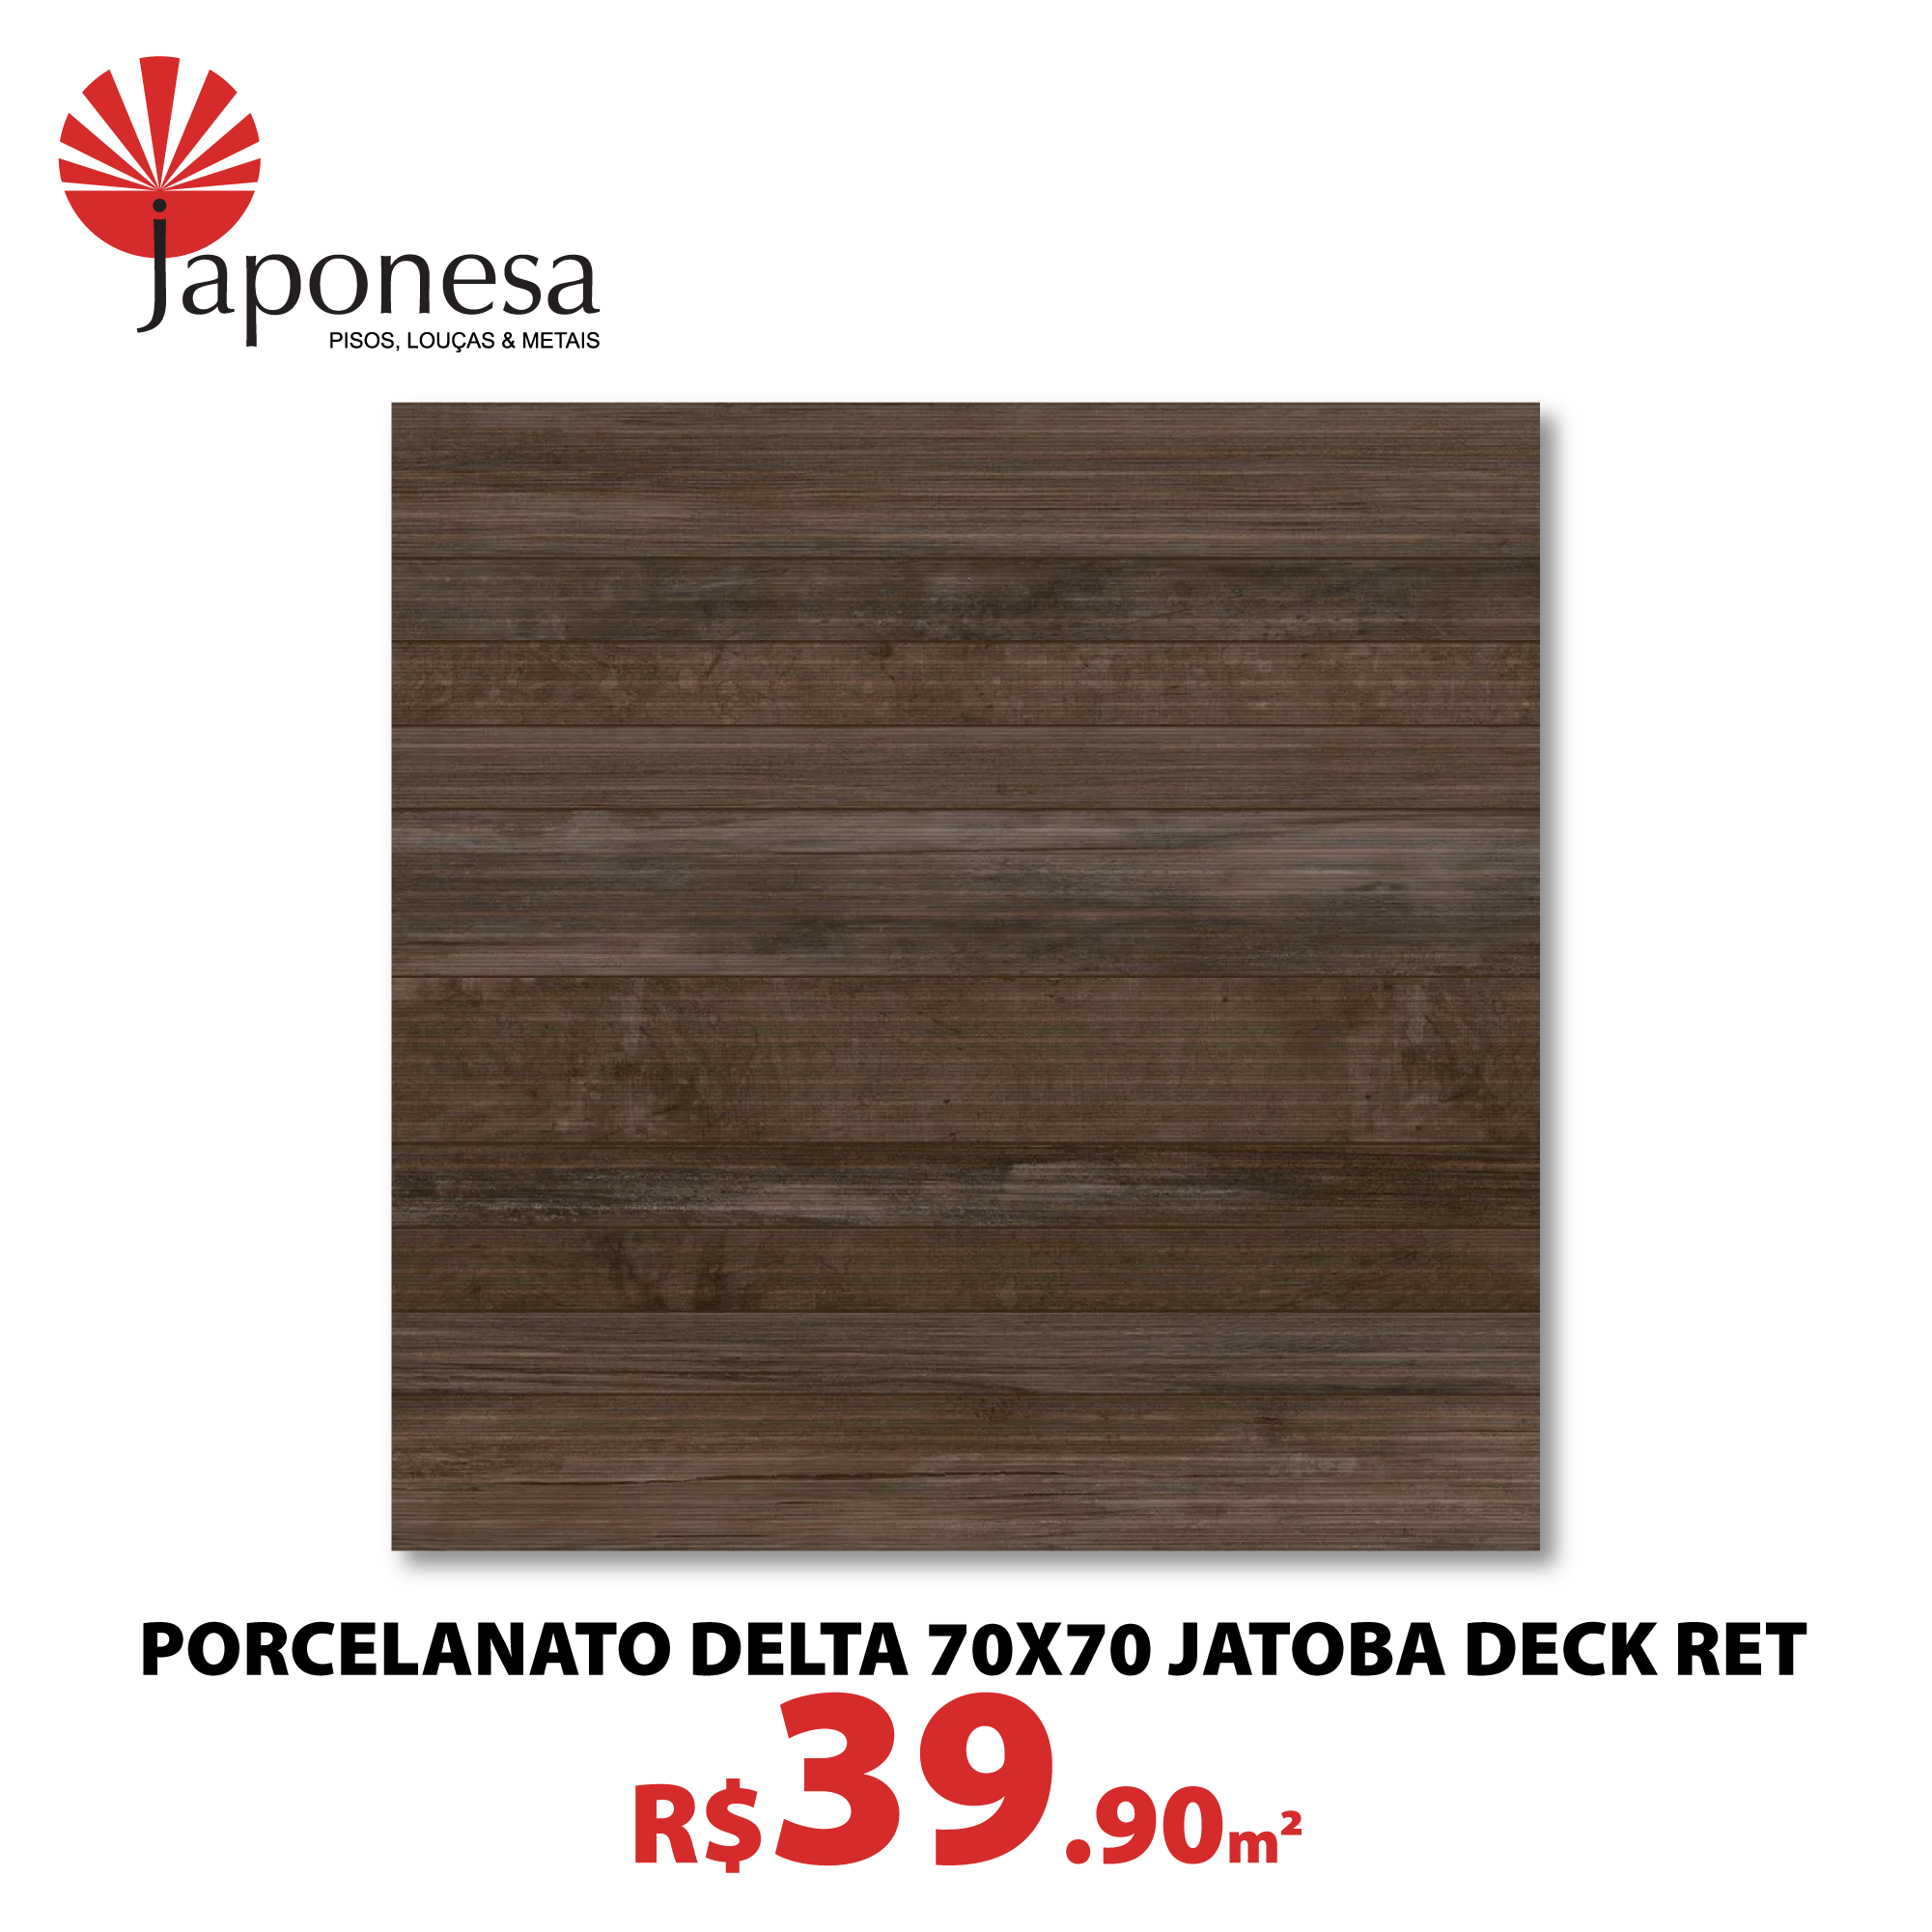 Porcelanato Delta 70×70 Jatoba Deck Ret